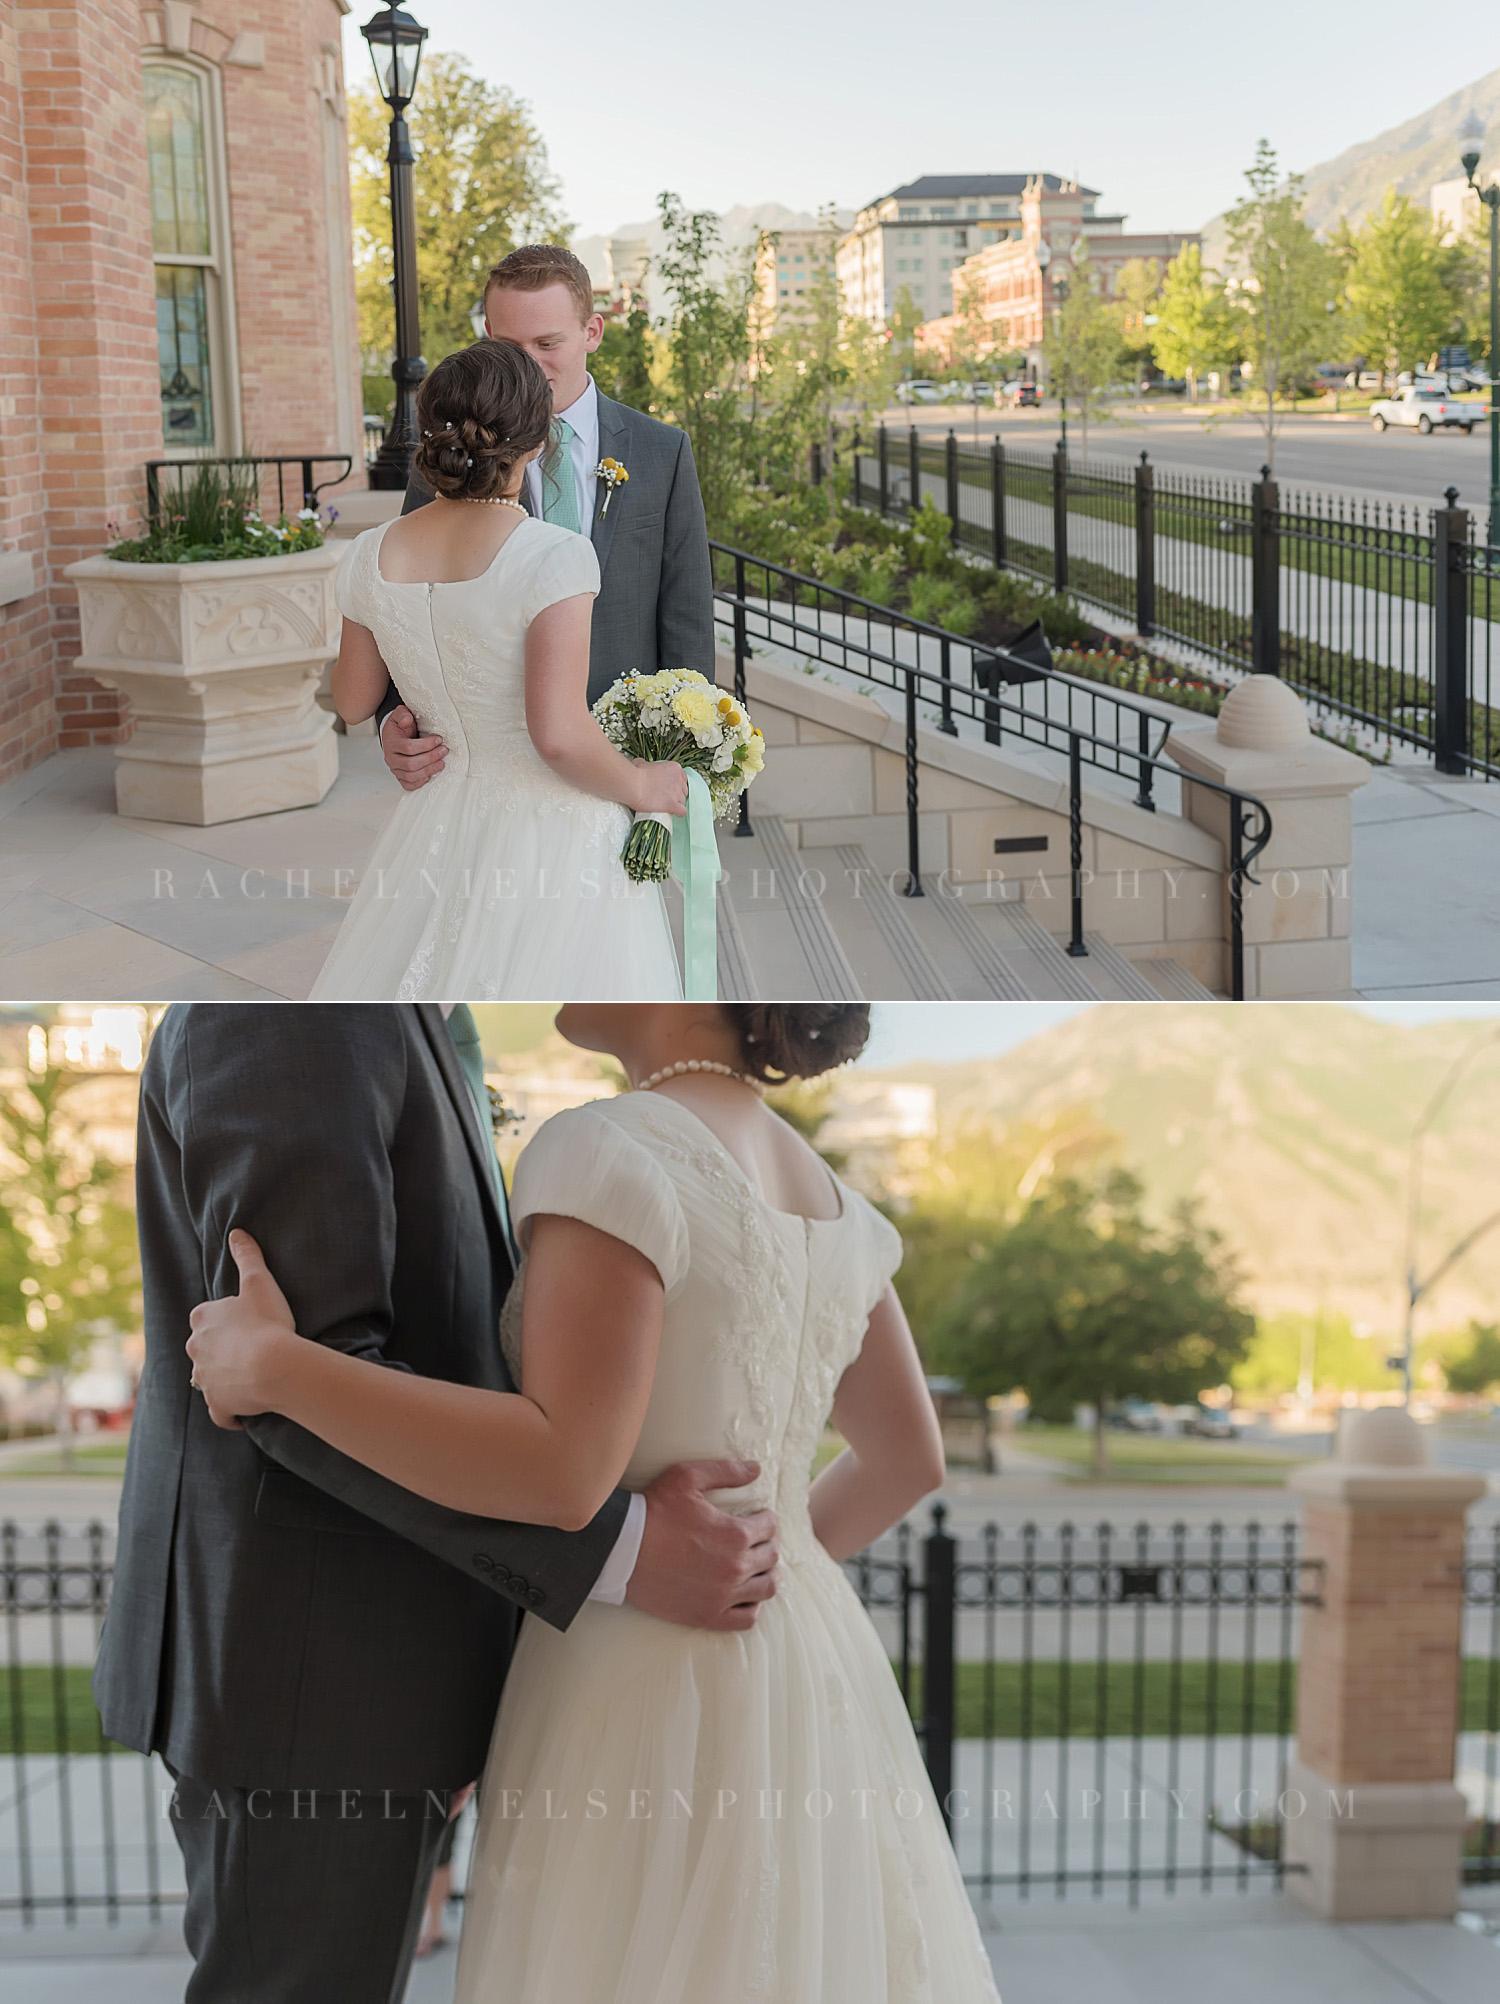 Provo-city-center-temple-wedding-2